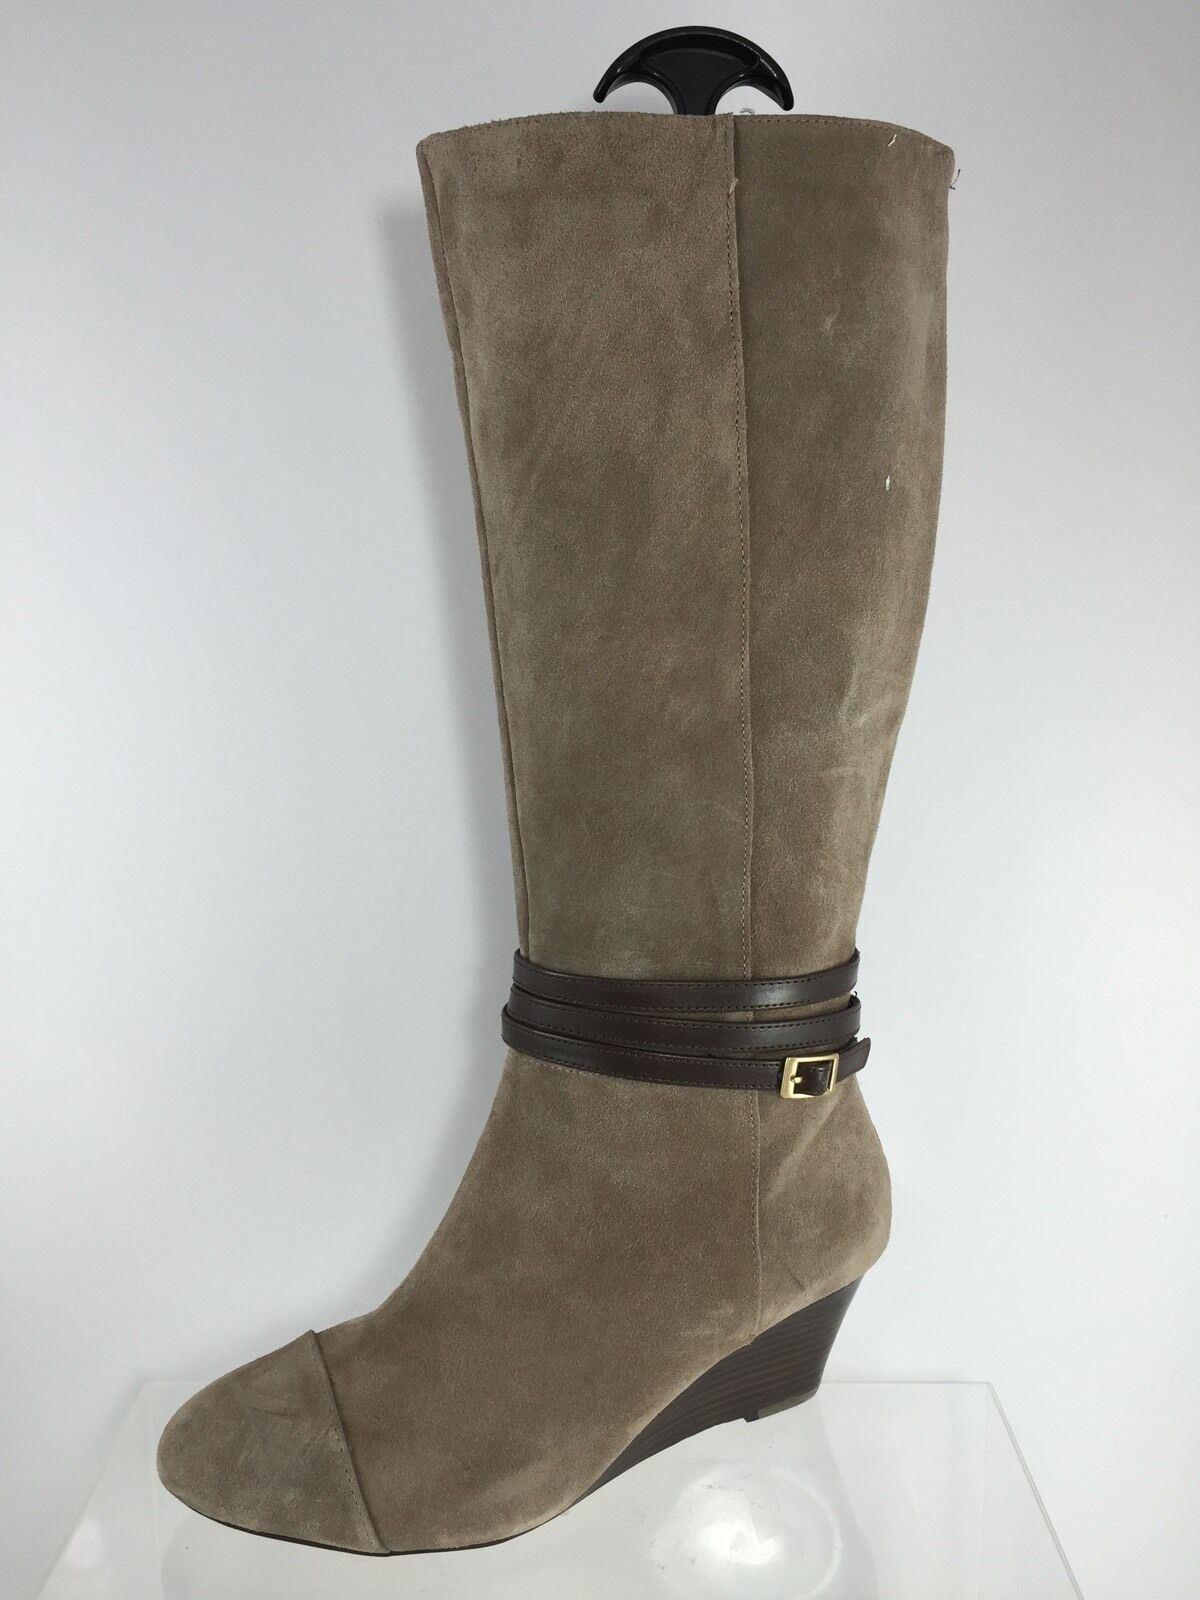 Julianne Hough Damenschuhe Stone Beige Leder Knee Stiefel 9.5 B